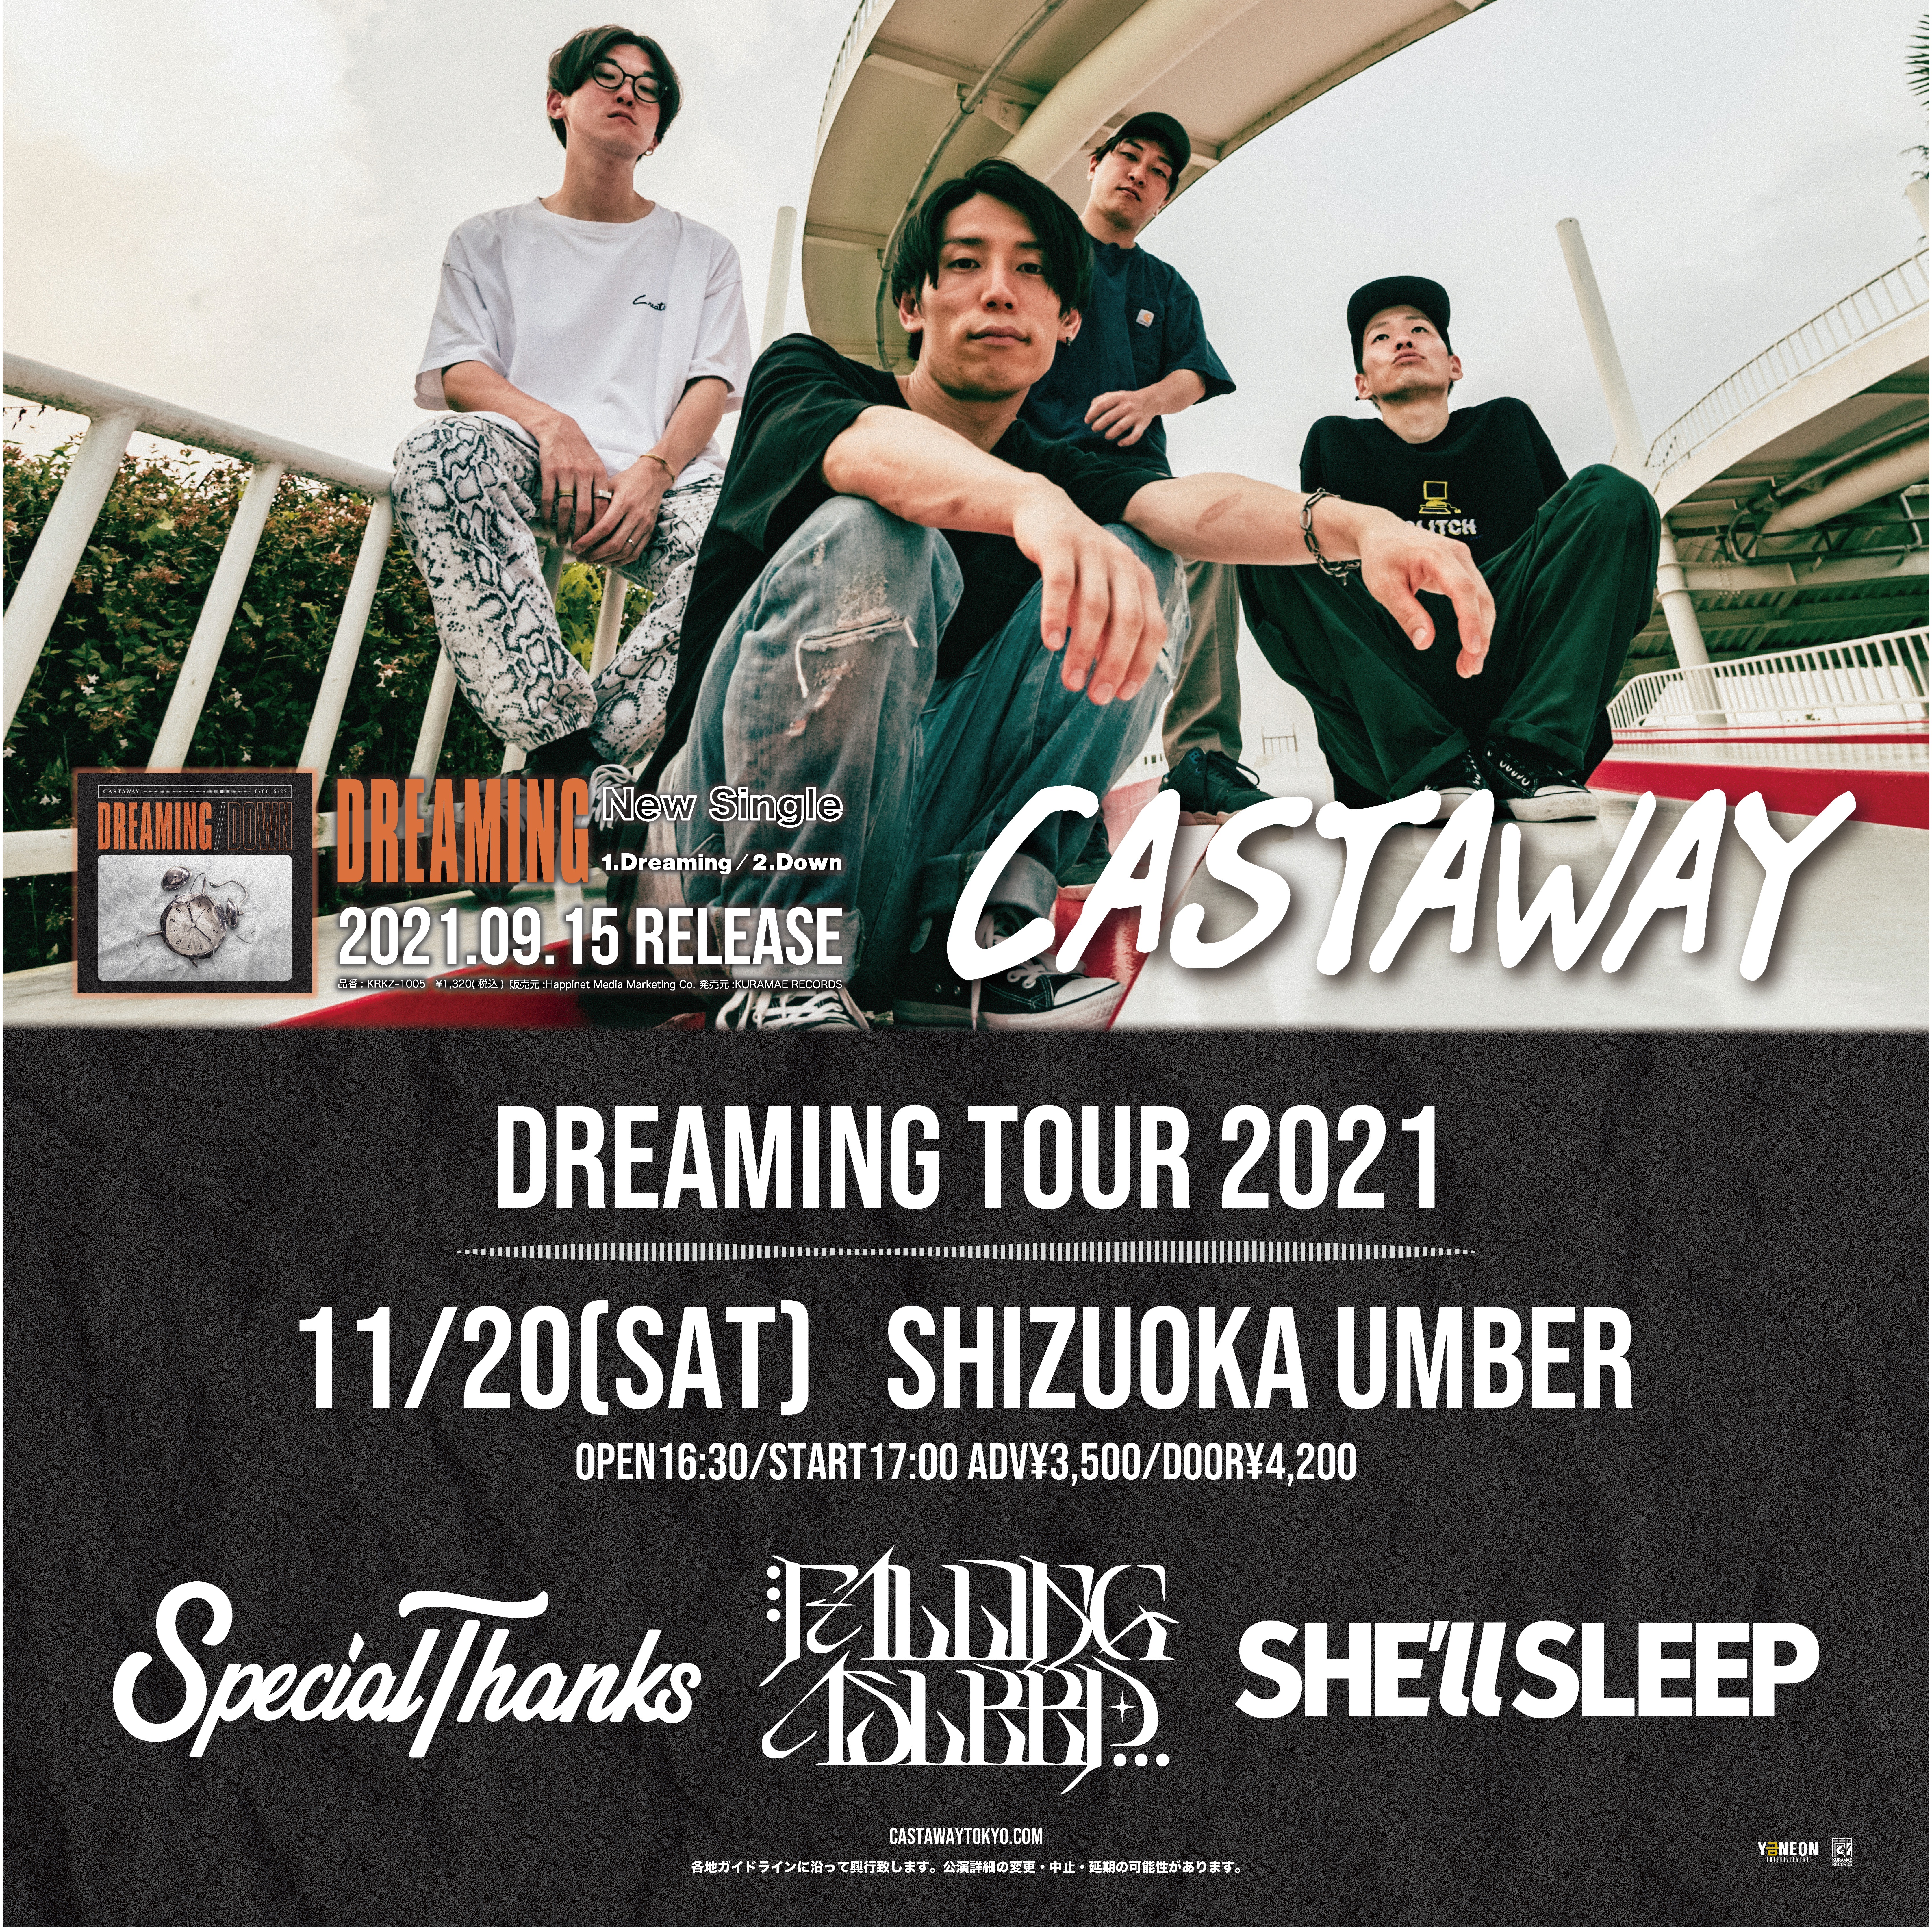 DREAMING TOUR 2021